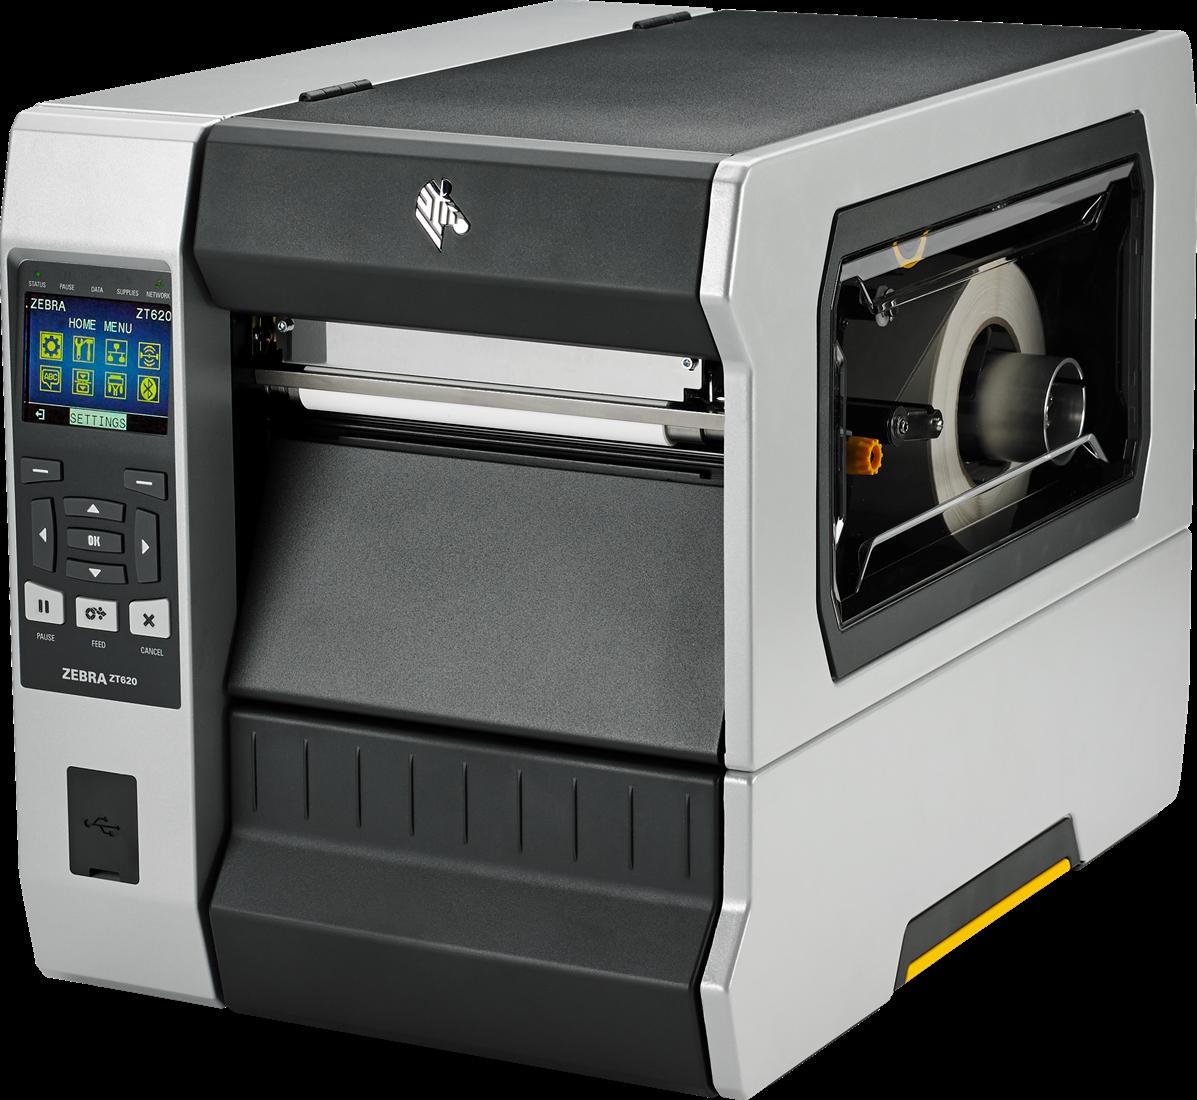 Zebra Gk420d Print Network Configuration